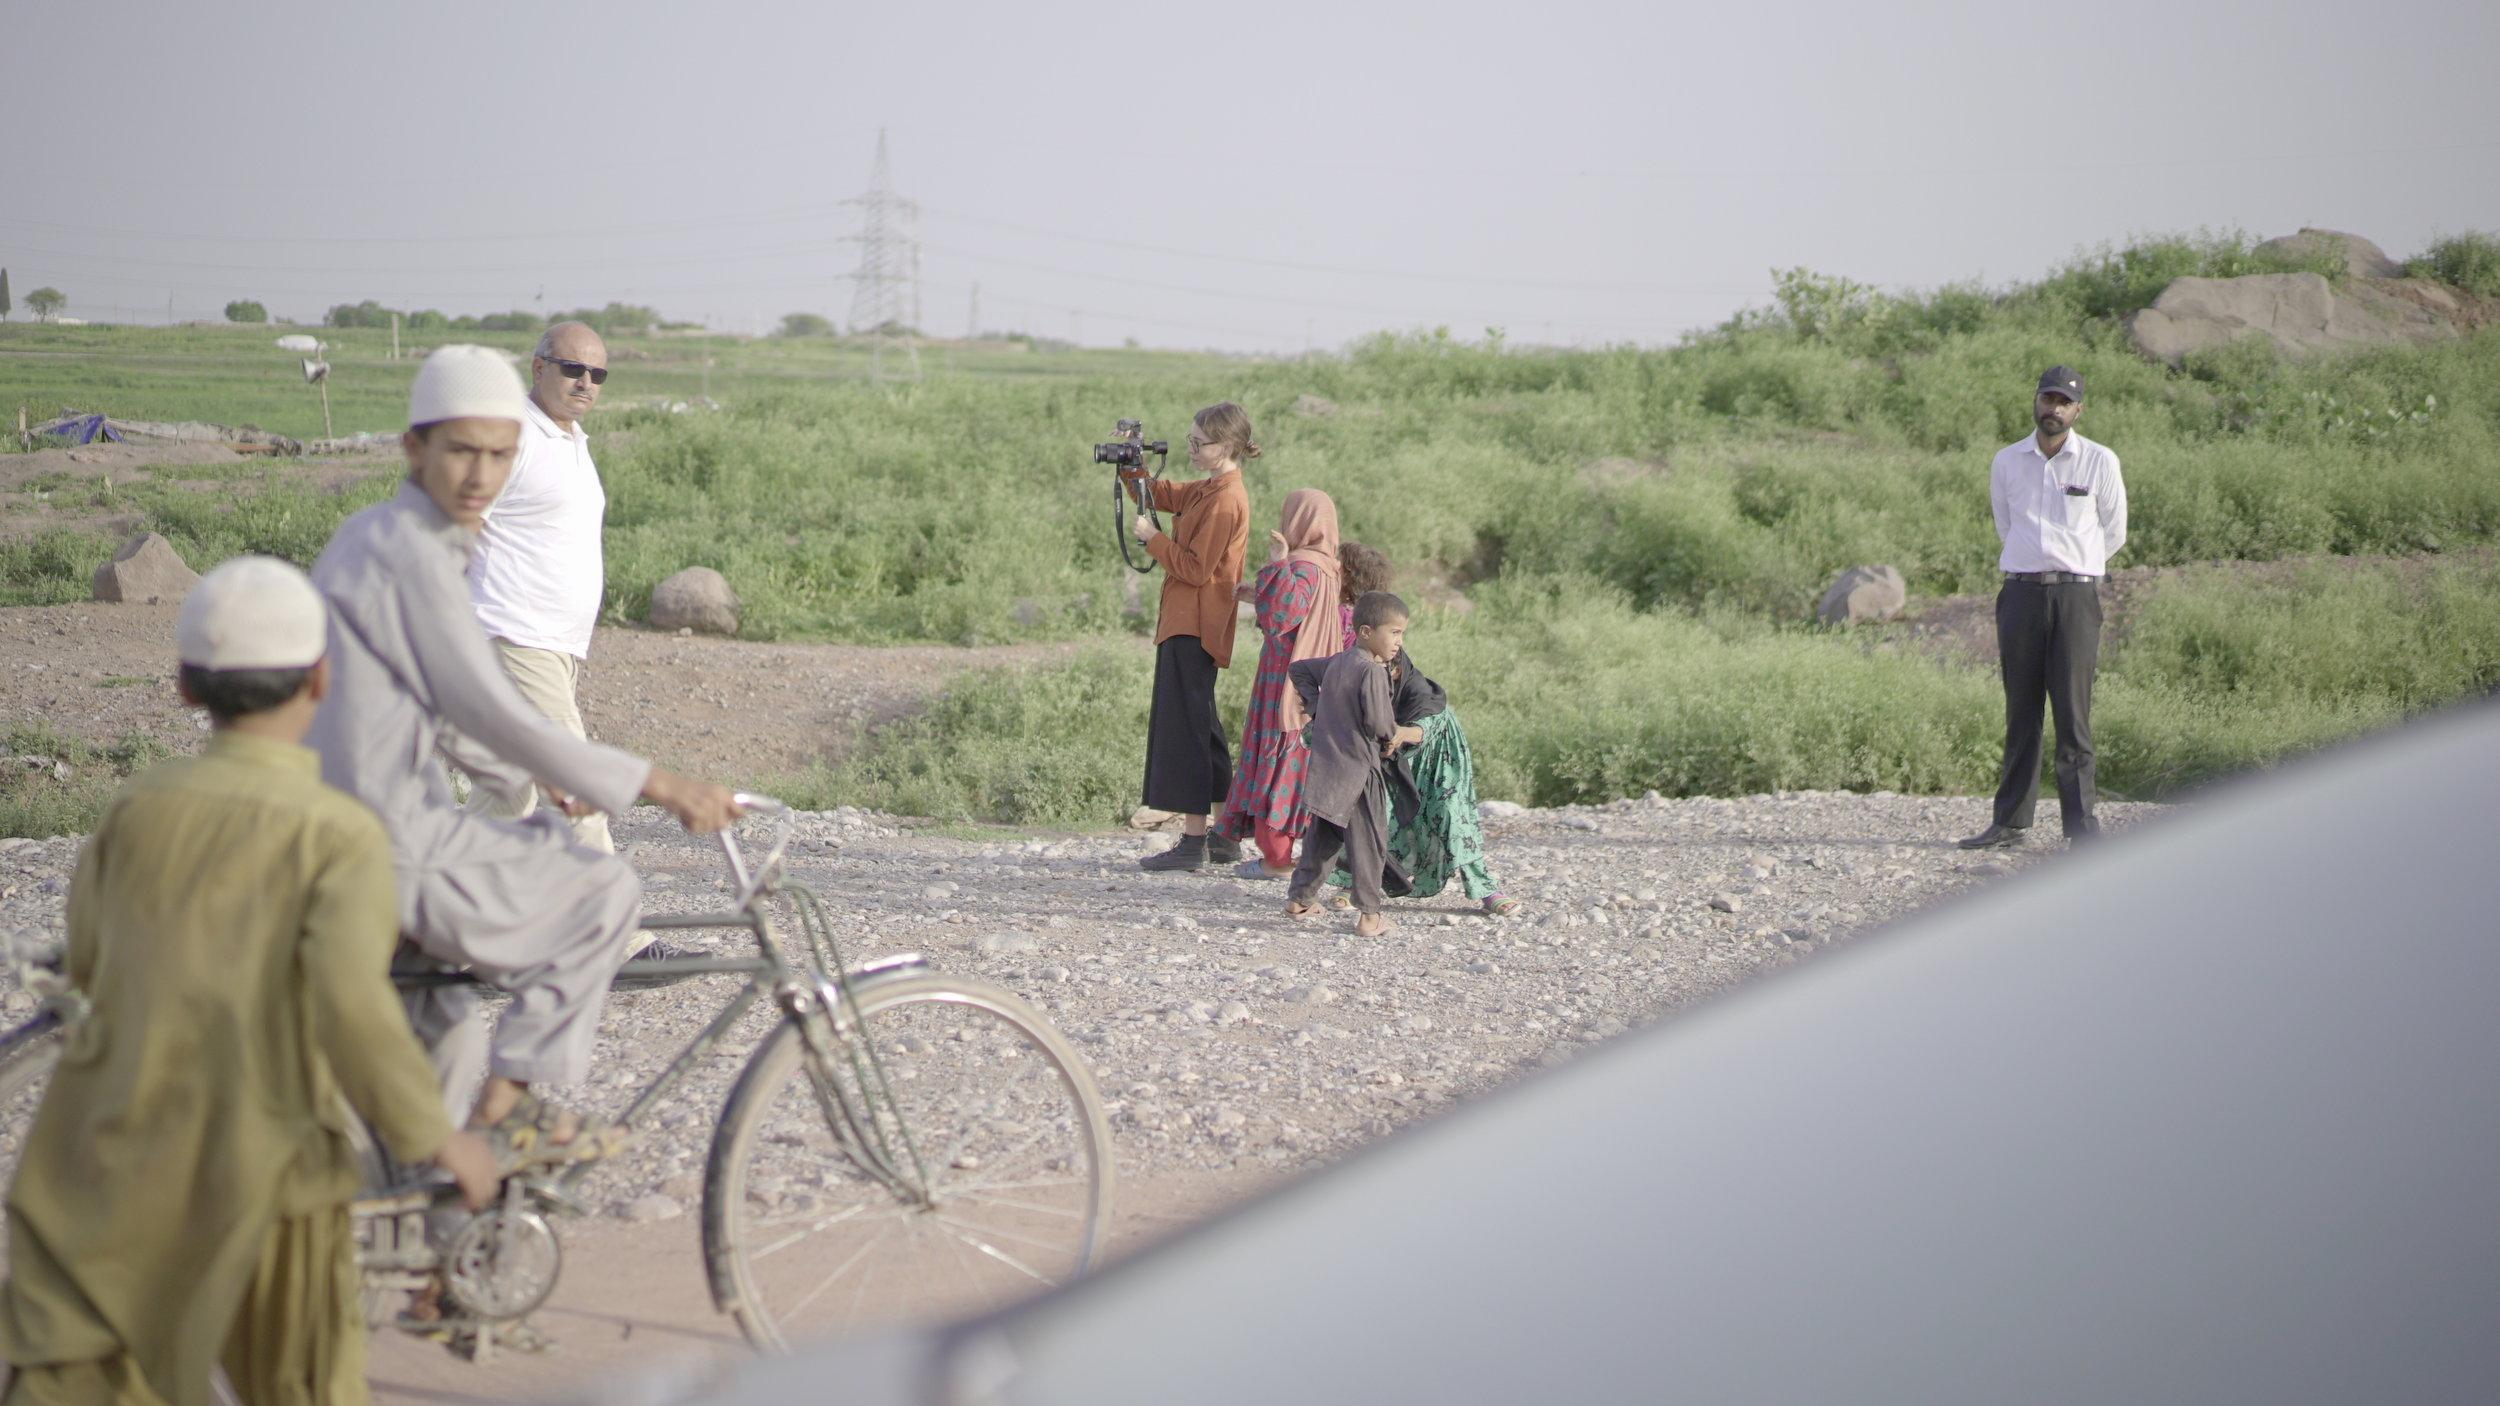 180730_AfghanCamp_B_00007.JPG